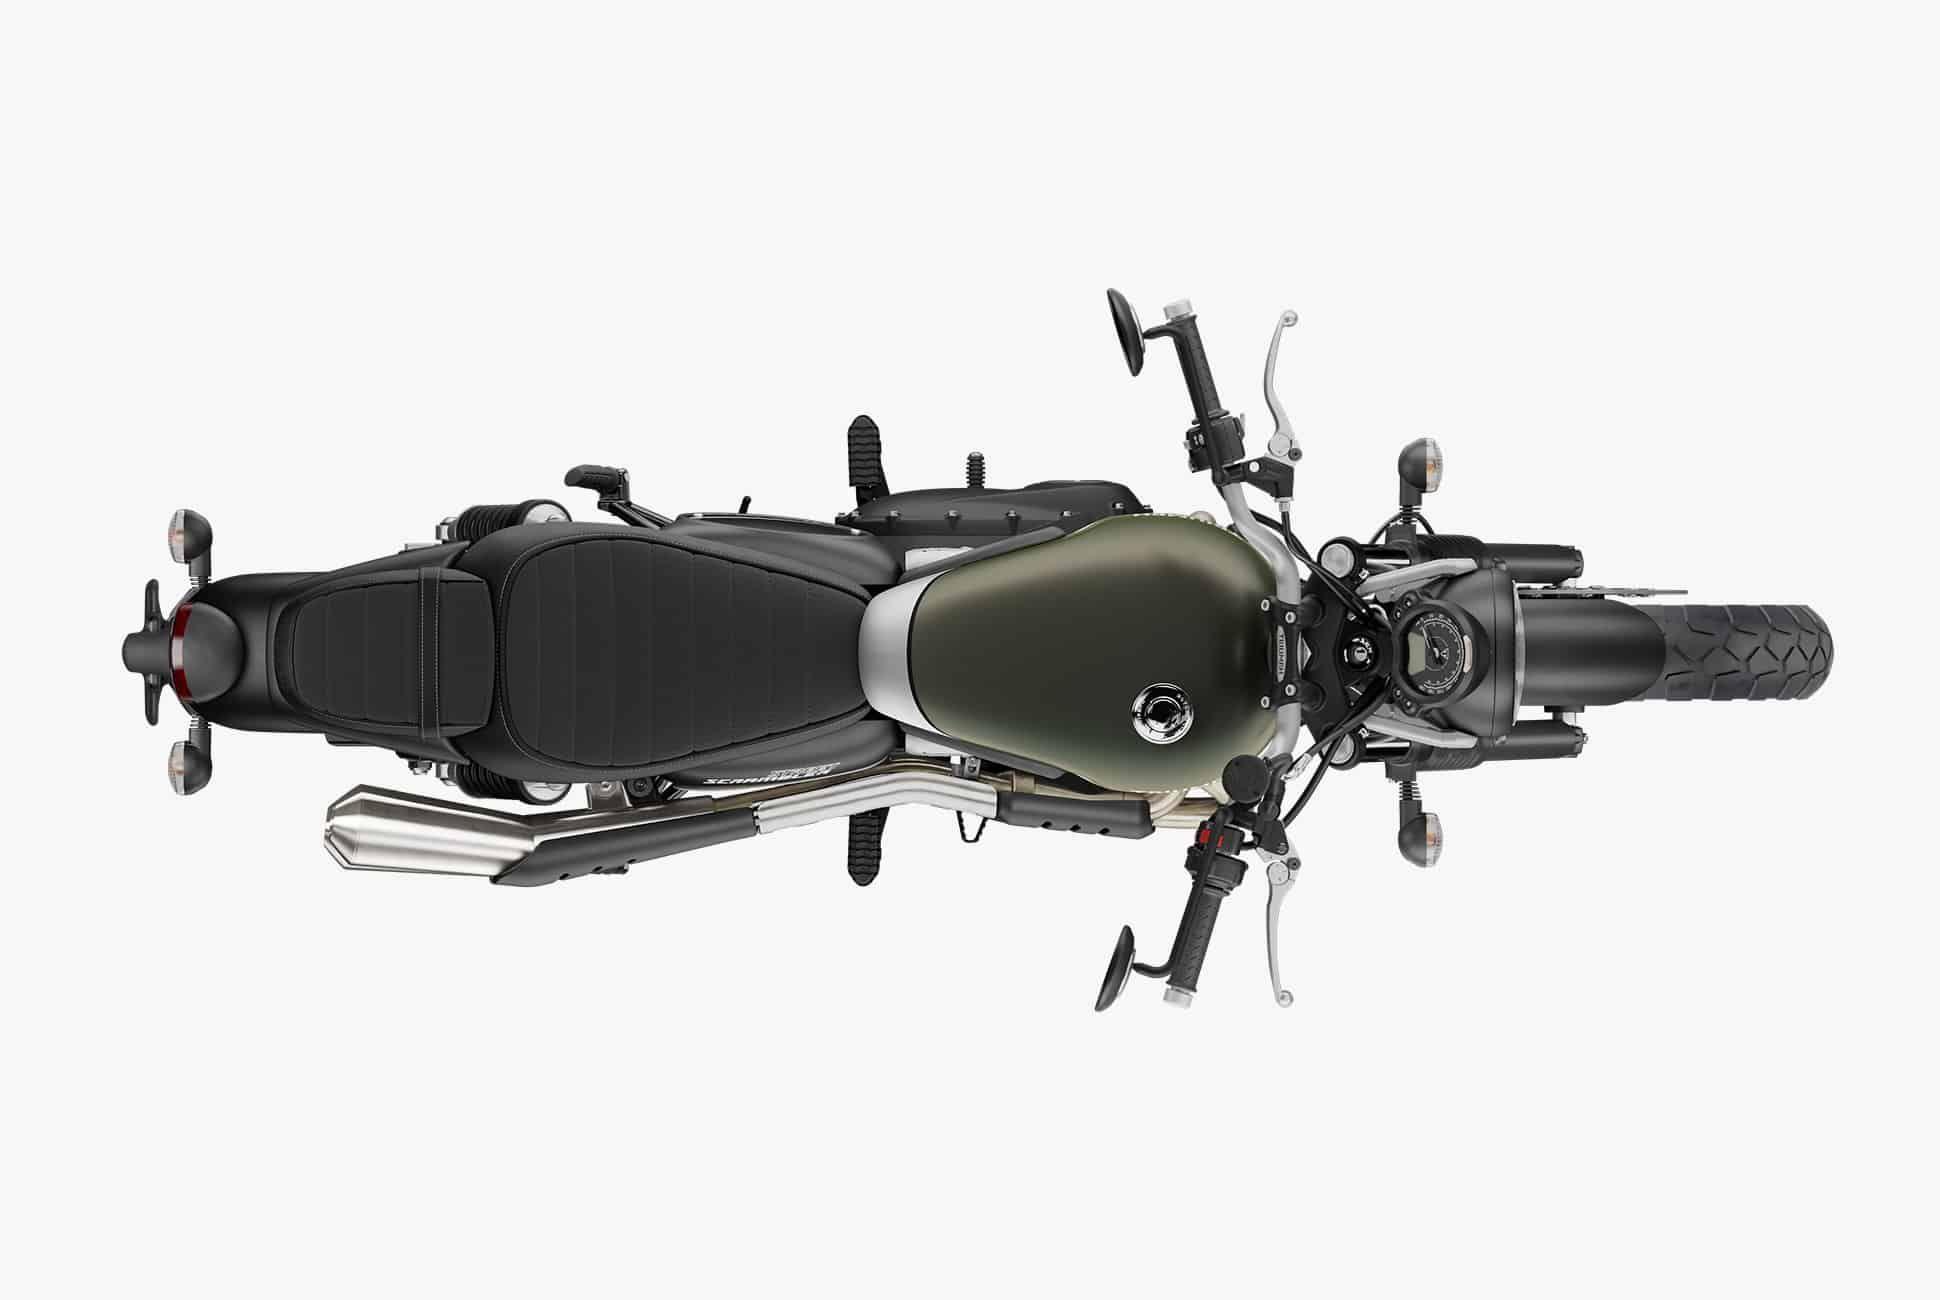 2019-Triumph-Street-Scrambler-gear-patrol-slide-3